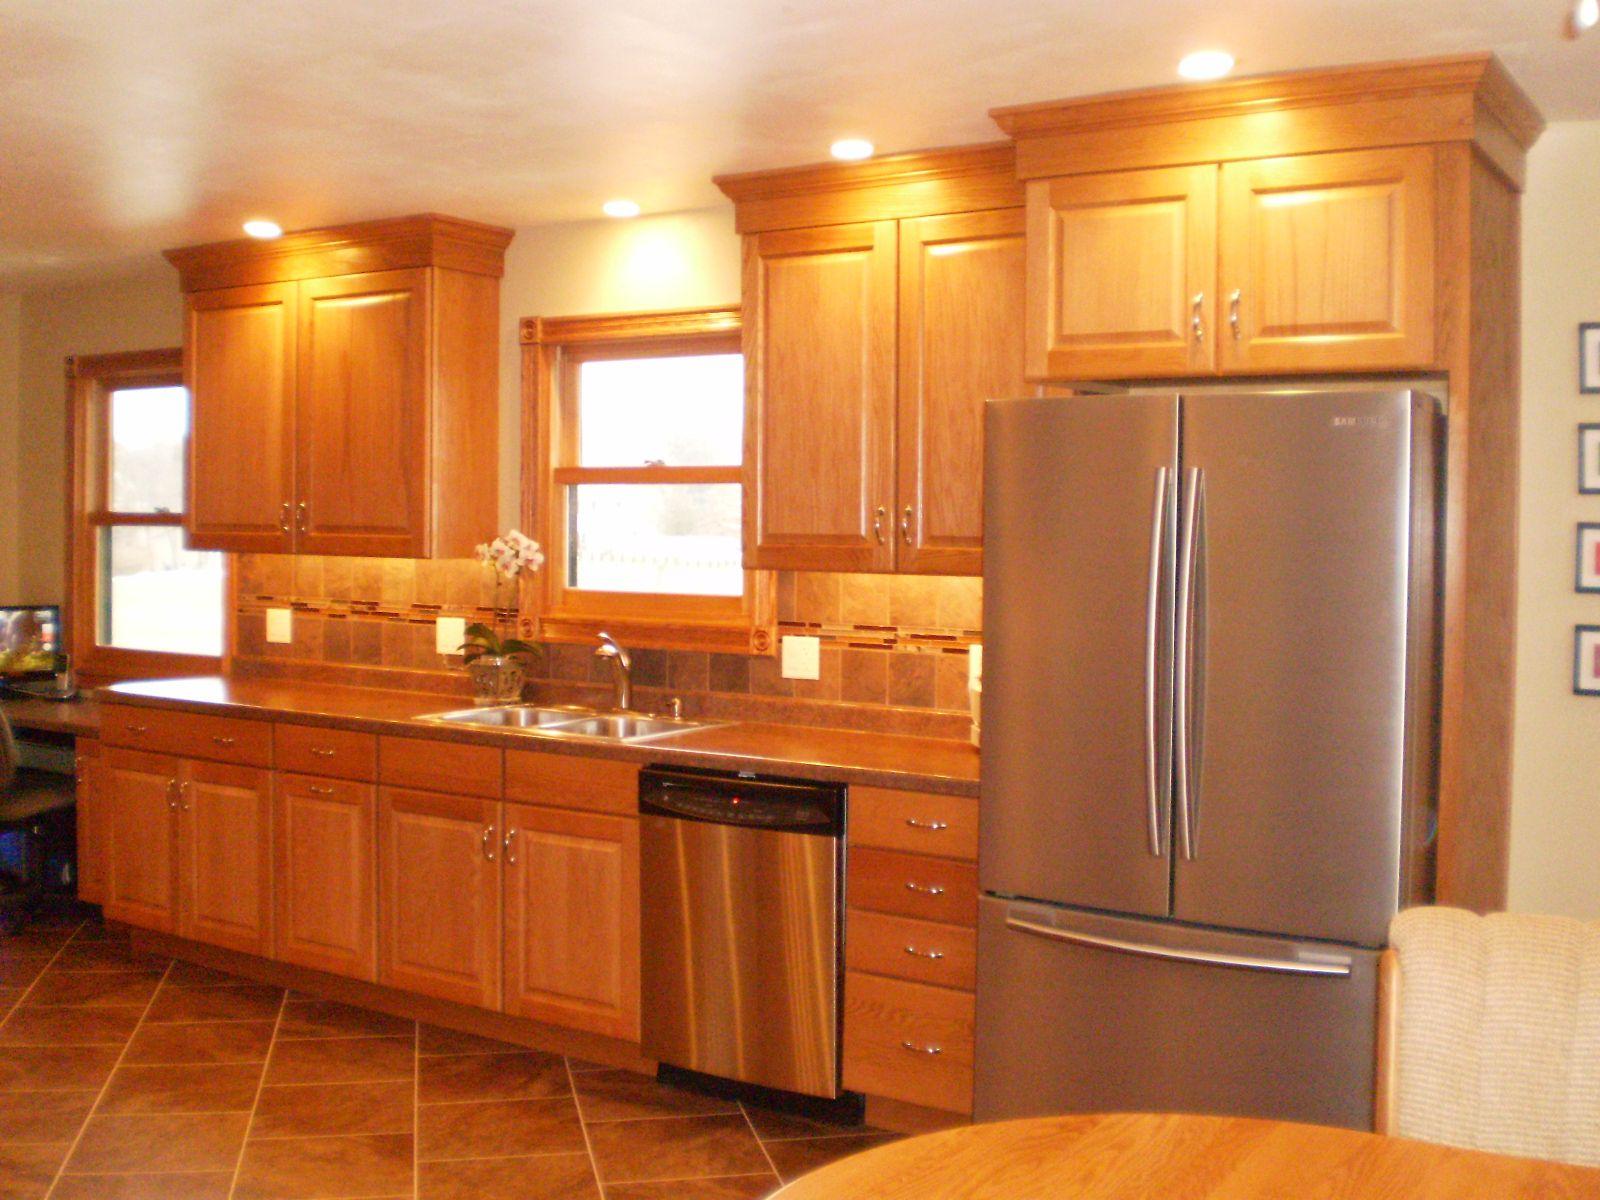 Vinyl Floor Tile Backsplash Oak Cabinets Luxury Vinyl Floor Tile Tile Backsplash And